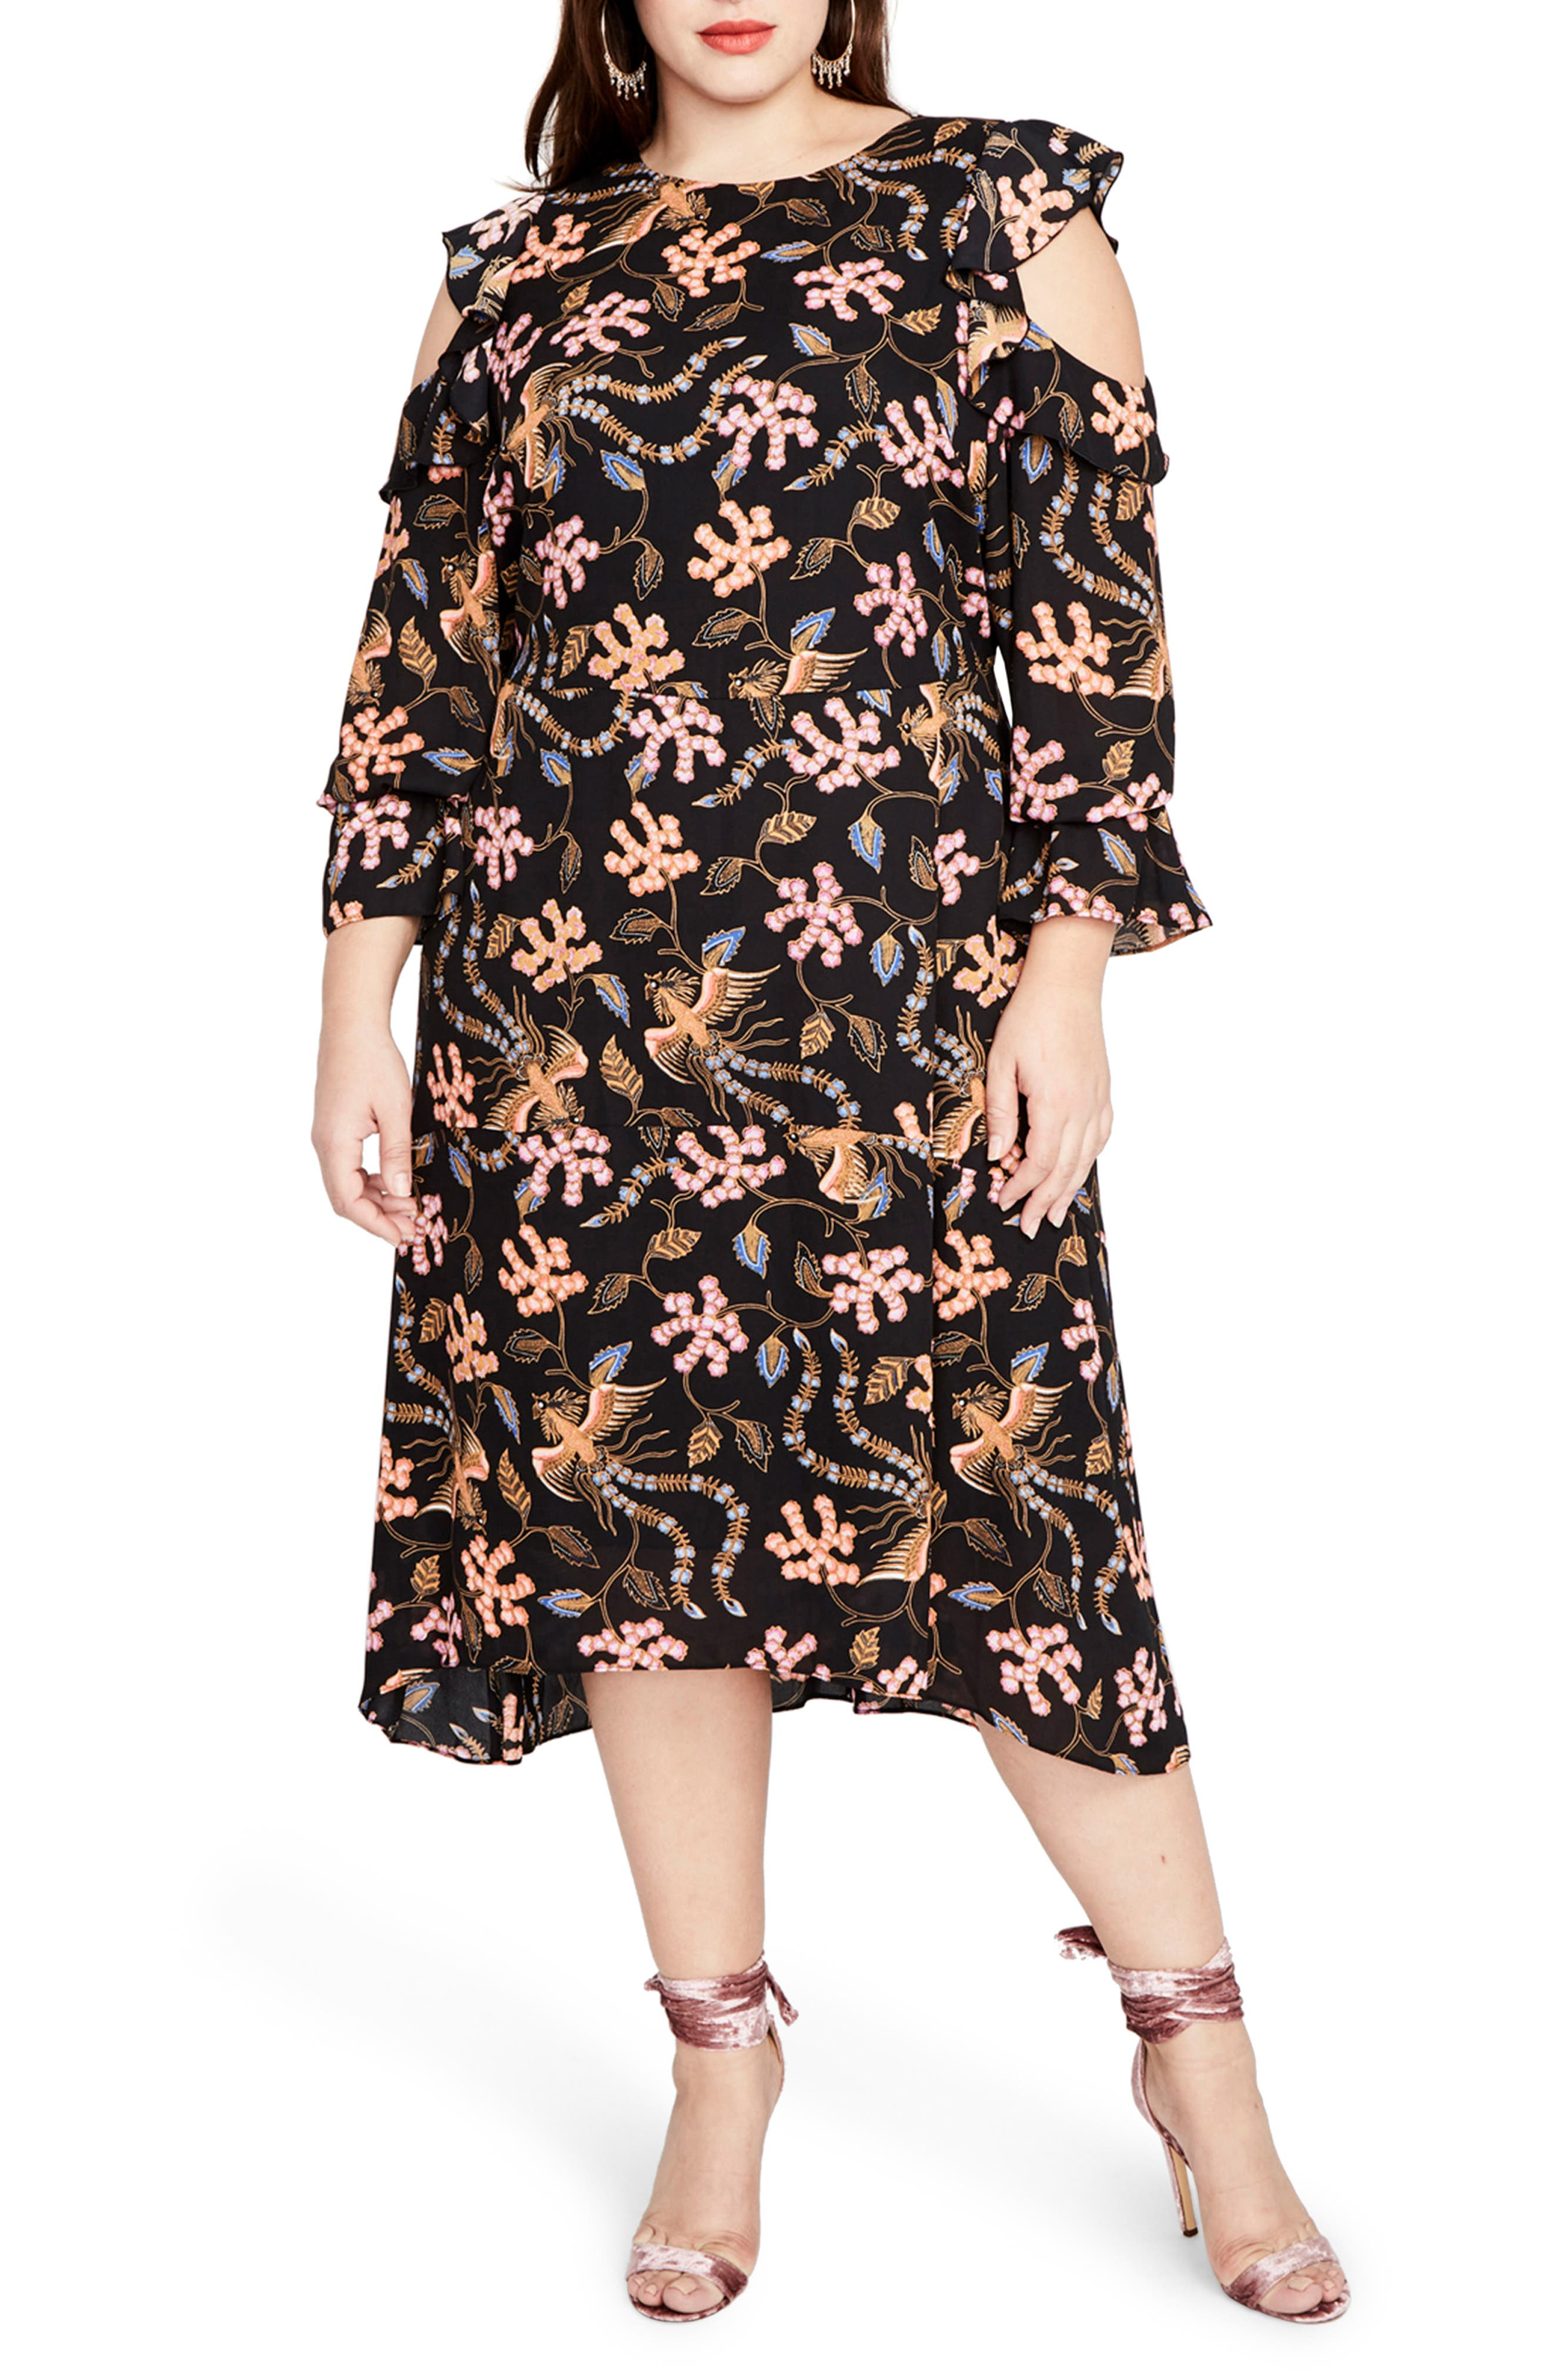 Alternate Image 1 Selected - RACHEL BY Rachel Roy Cold Shoulder Ruffle Midi Dress (Plus Size)